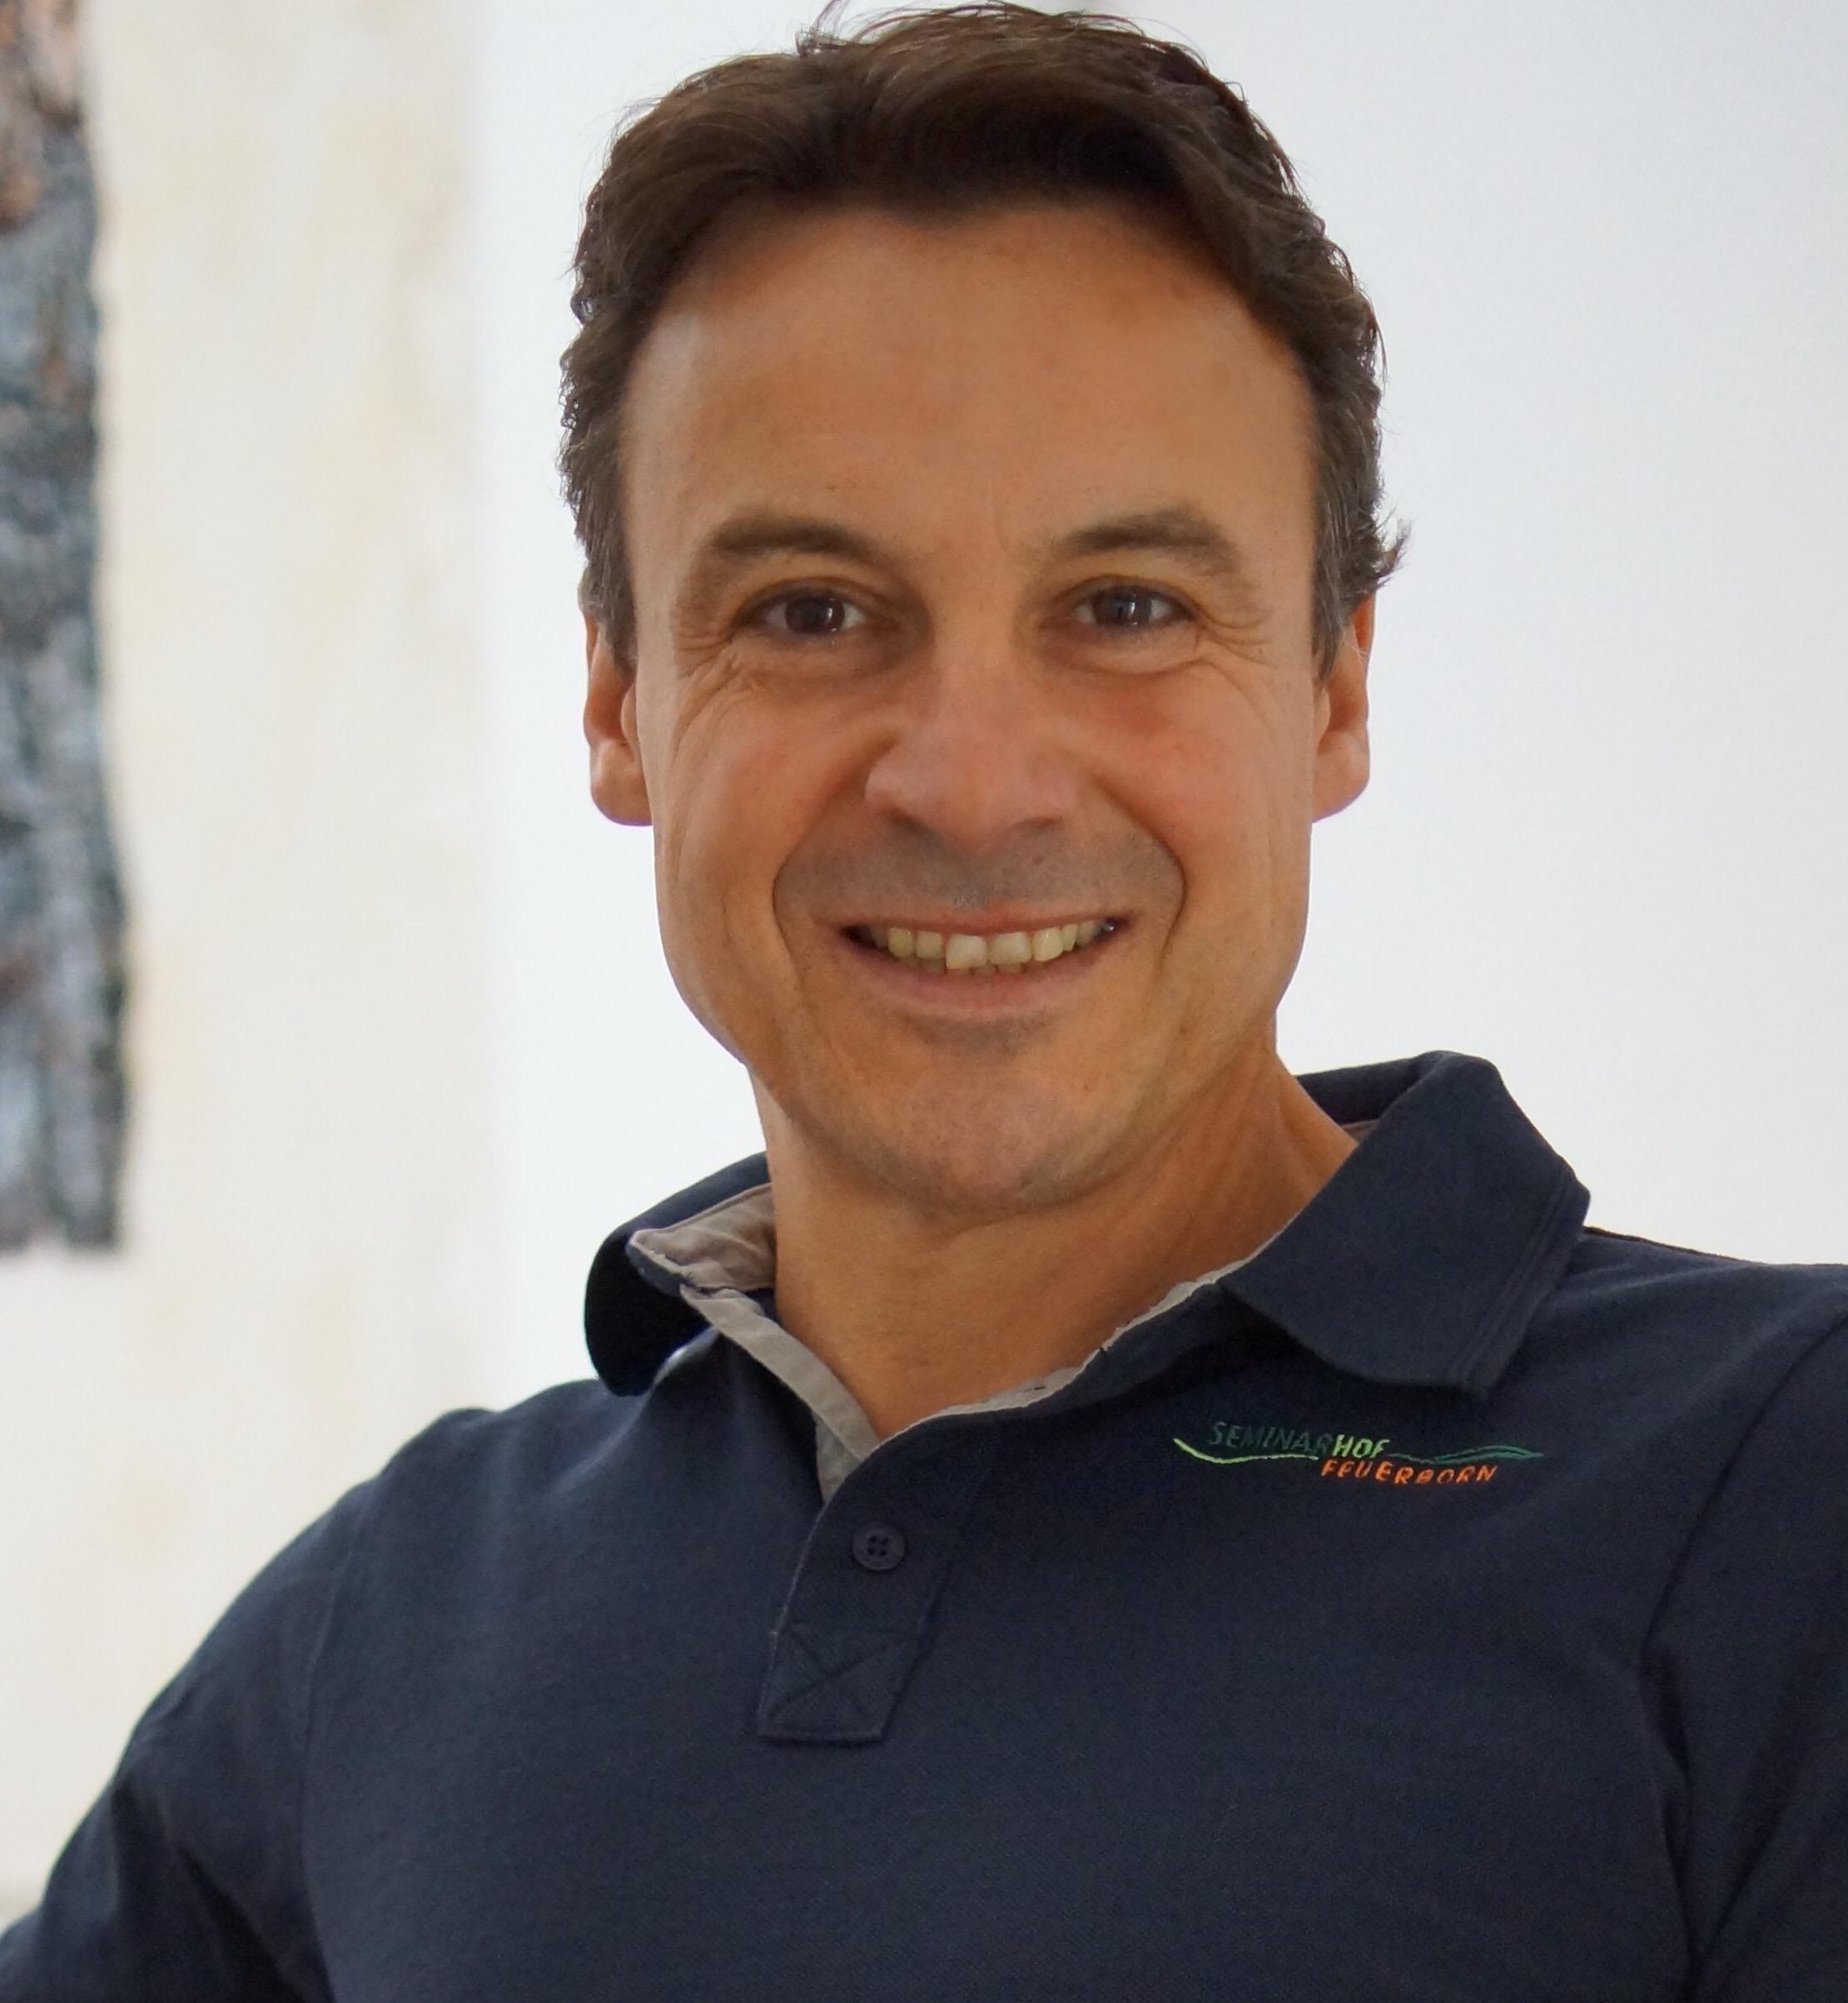 Jörg Feuerborn